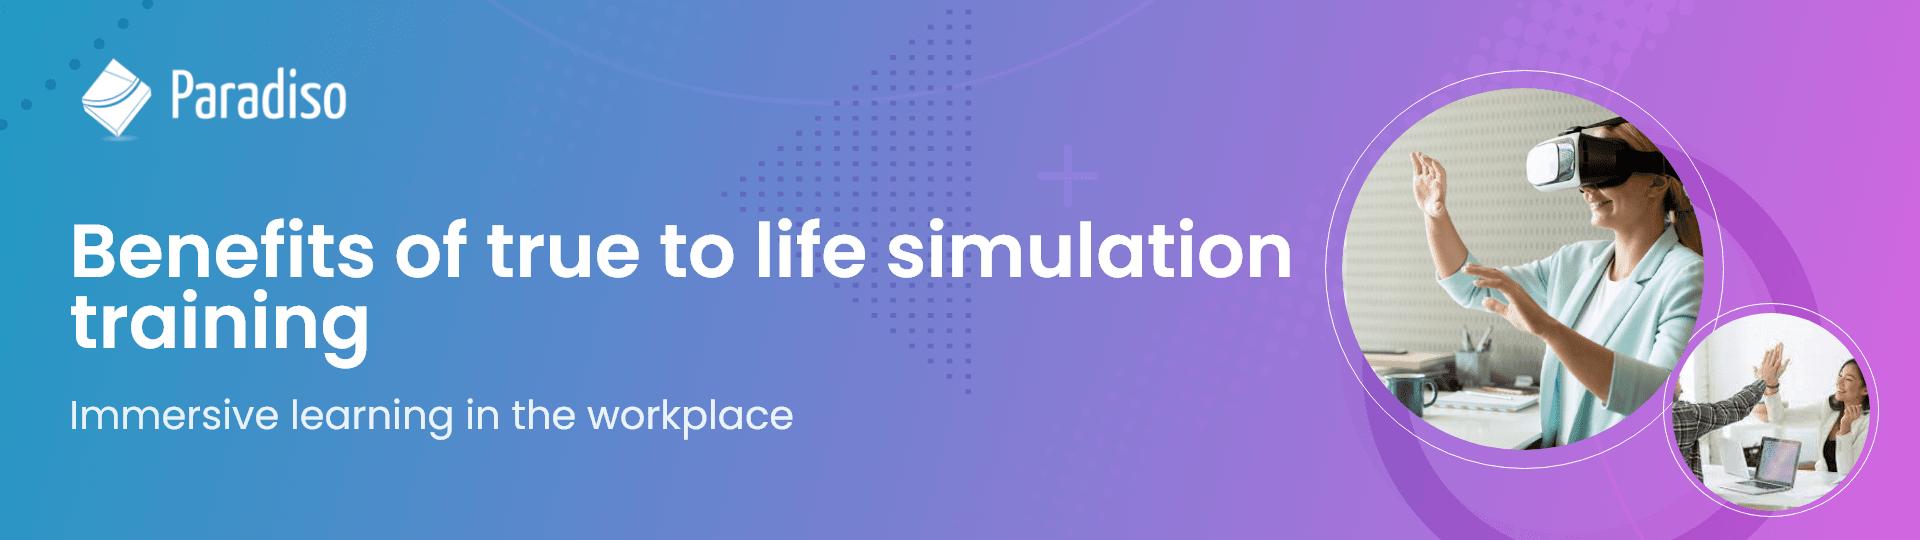 Benefits of true-to-life simulation training